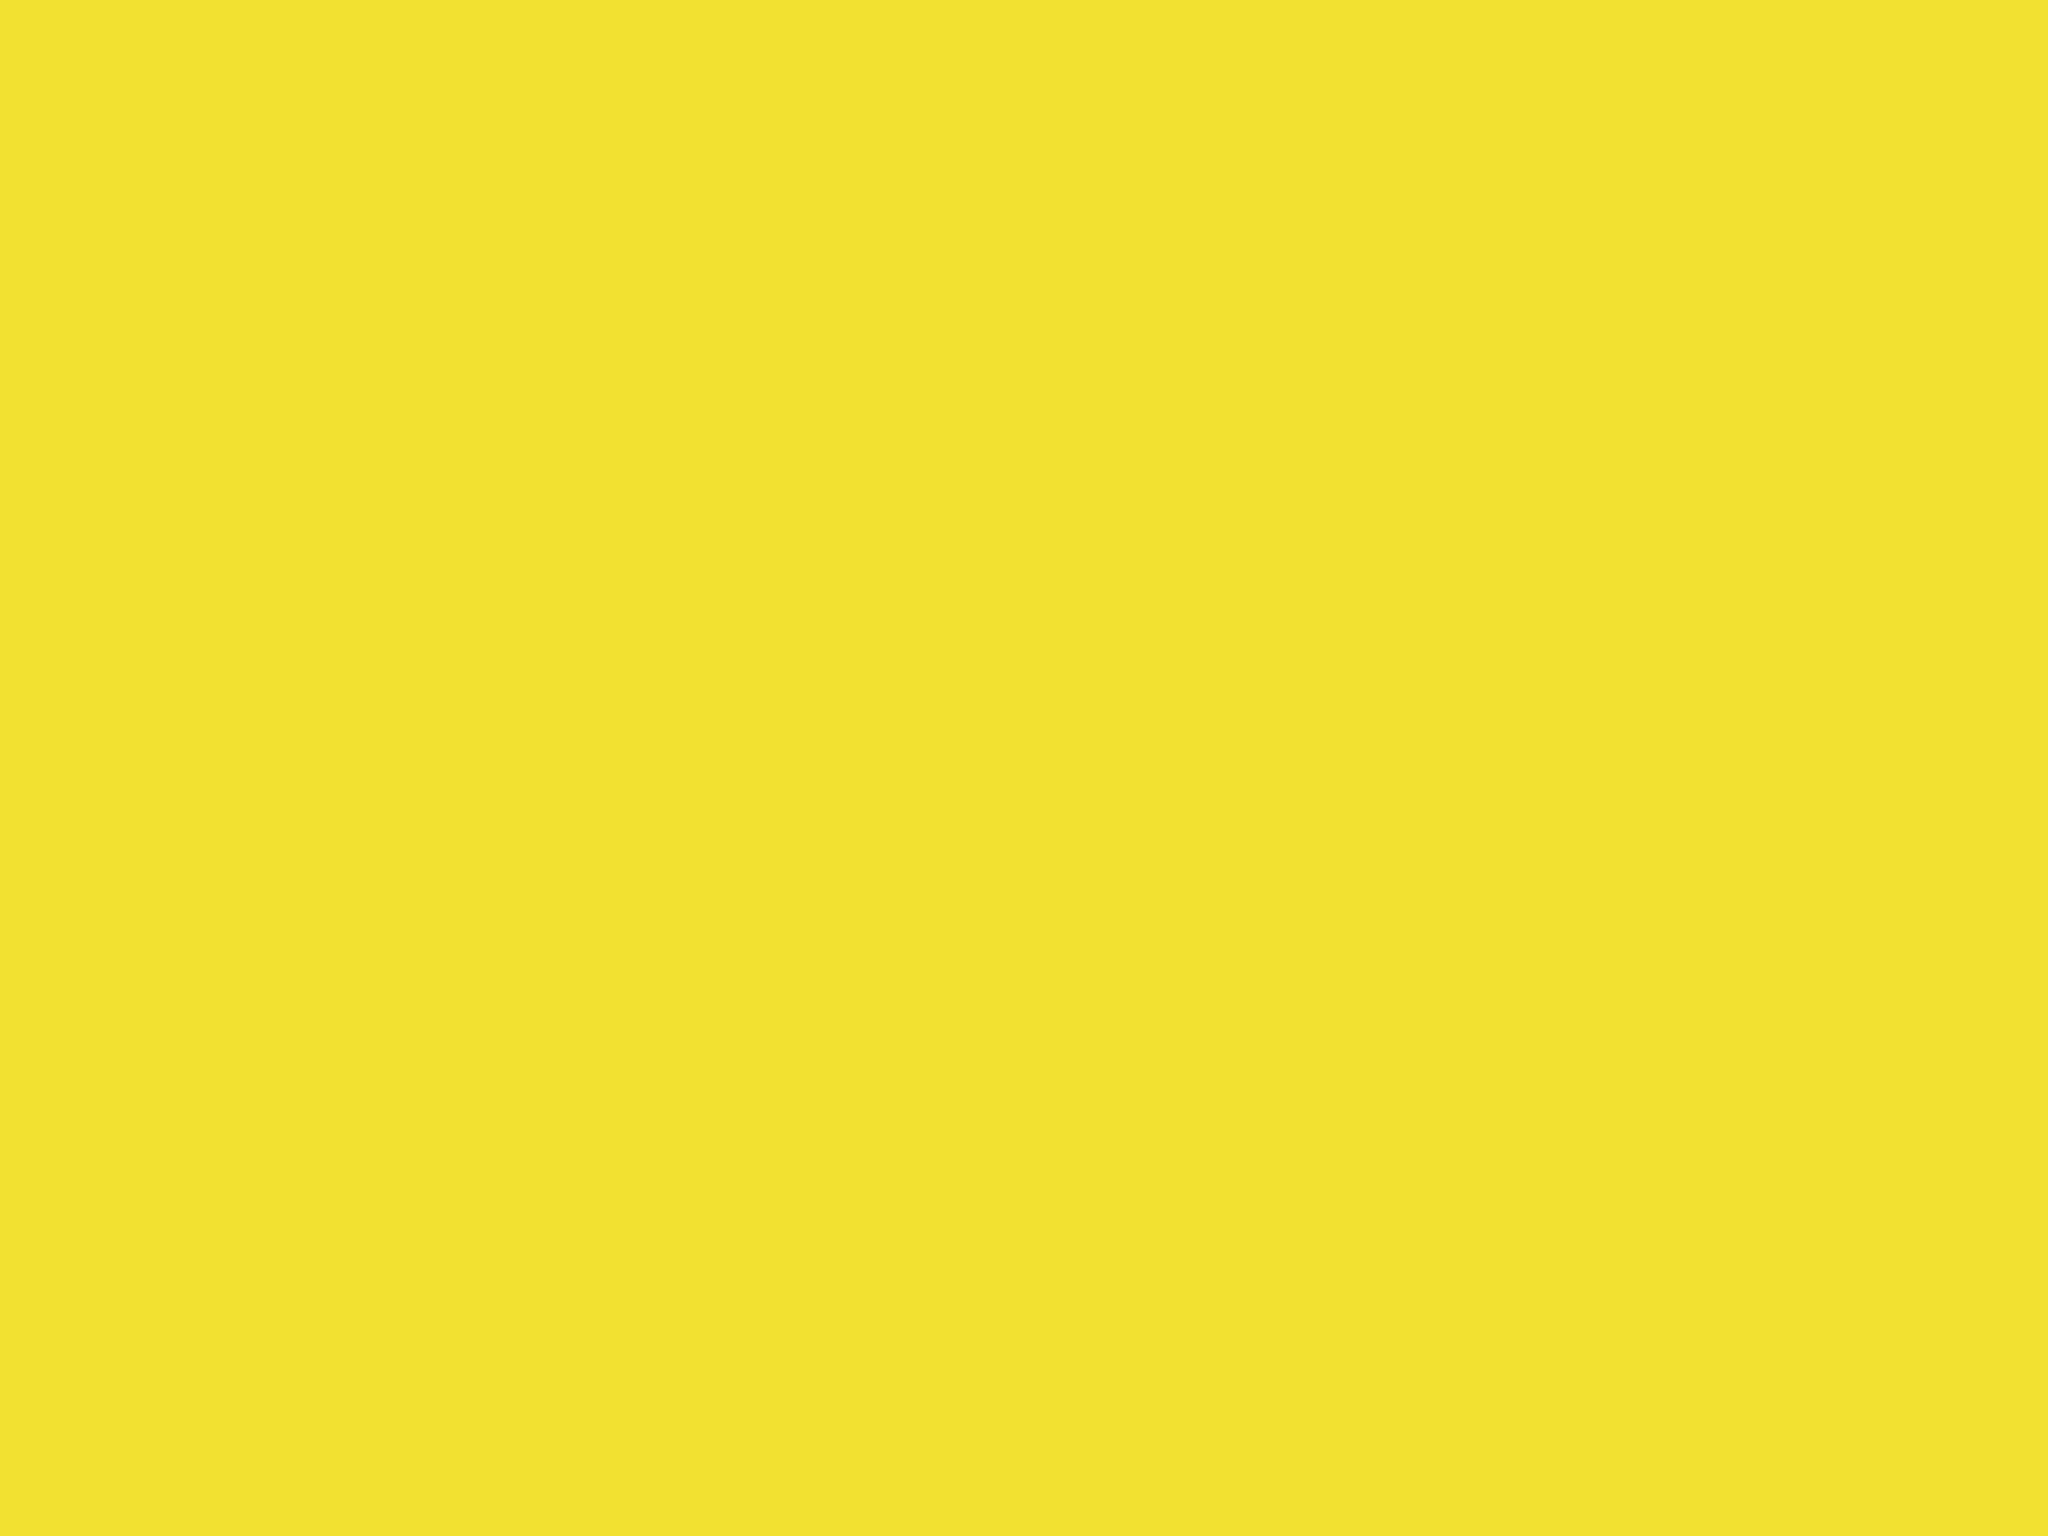 2048x1536 Dandelion Solid Color Background